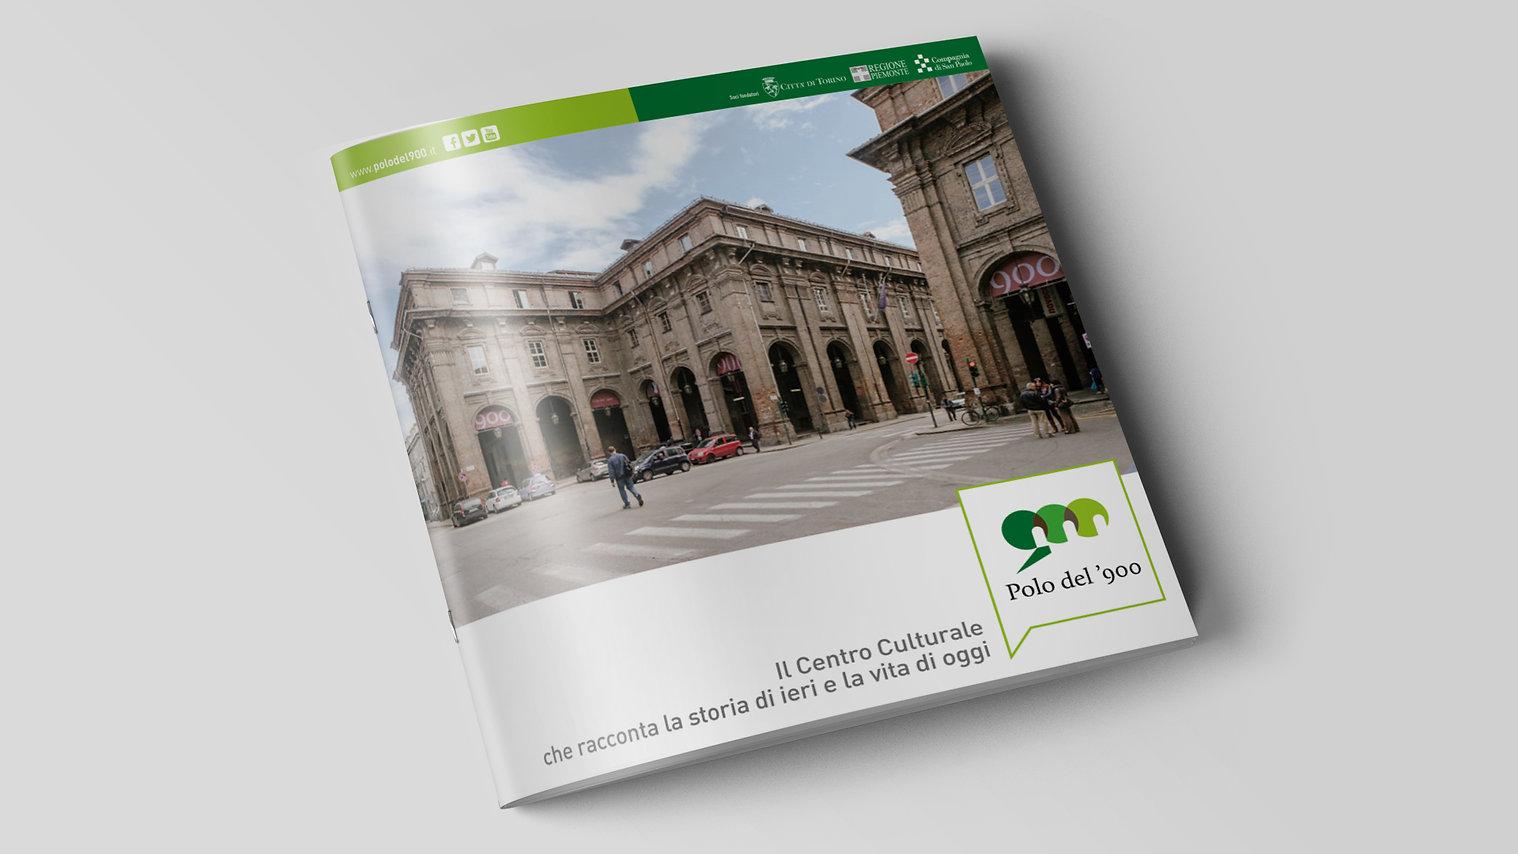 POLO 900 - Brochure.jpg